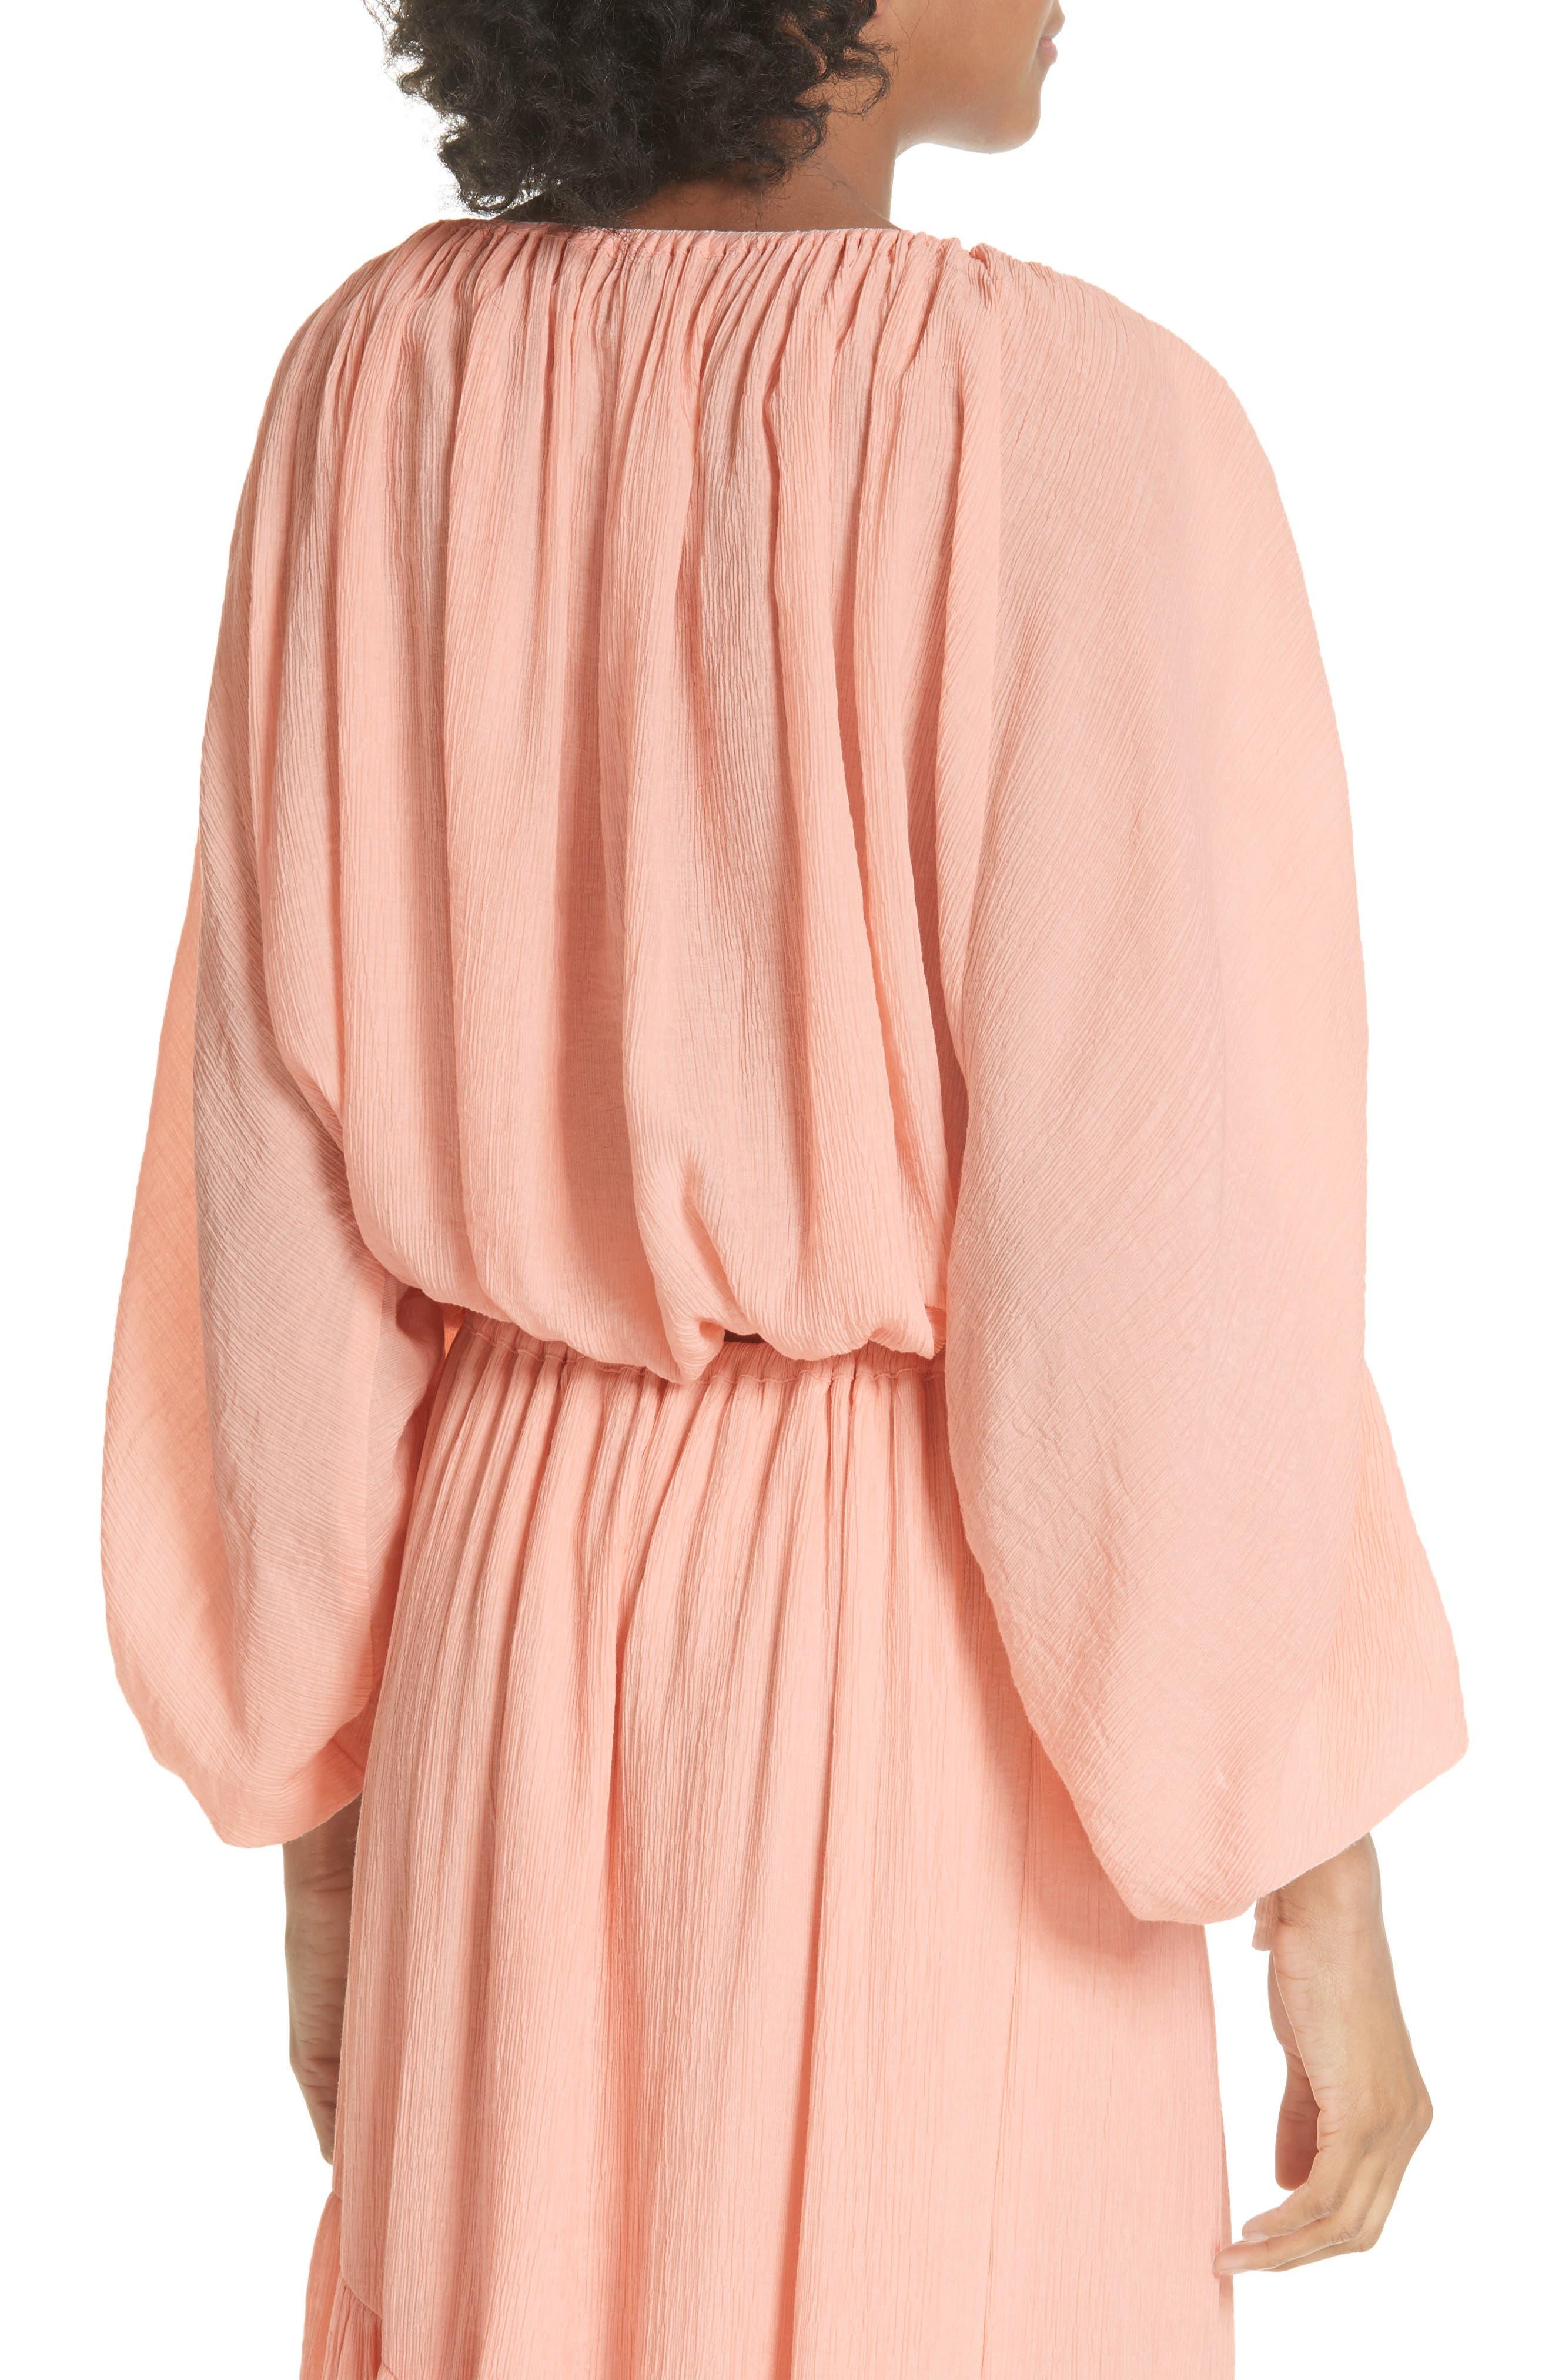 Elazara Ruched Sleeve Peasant Top,                             Alternate thumbnail 2, color,                             Summer Pink